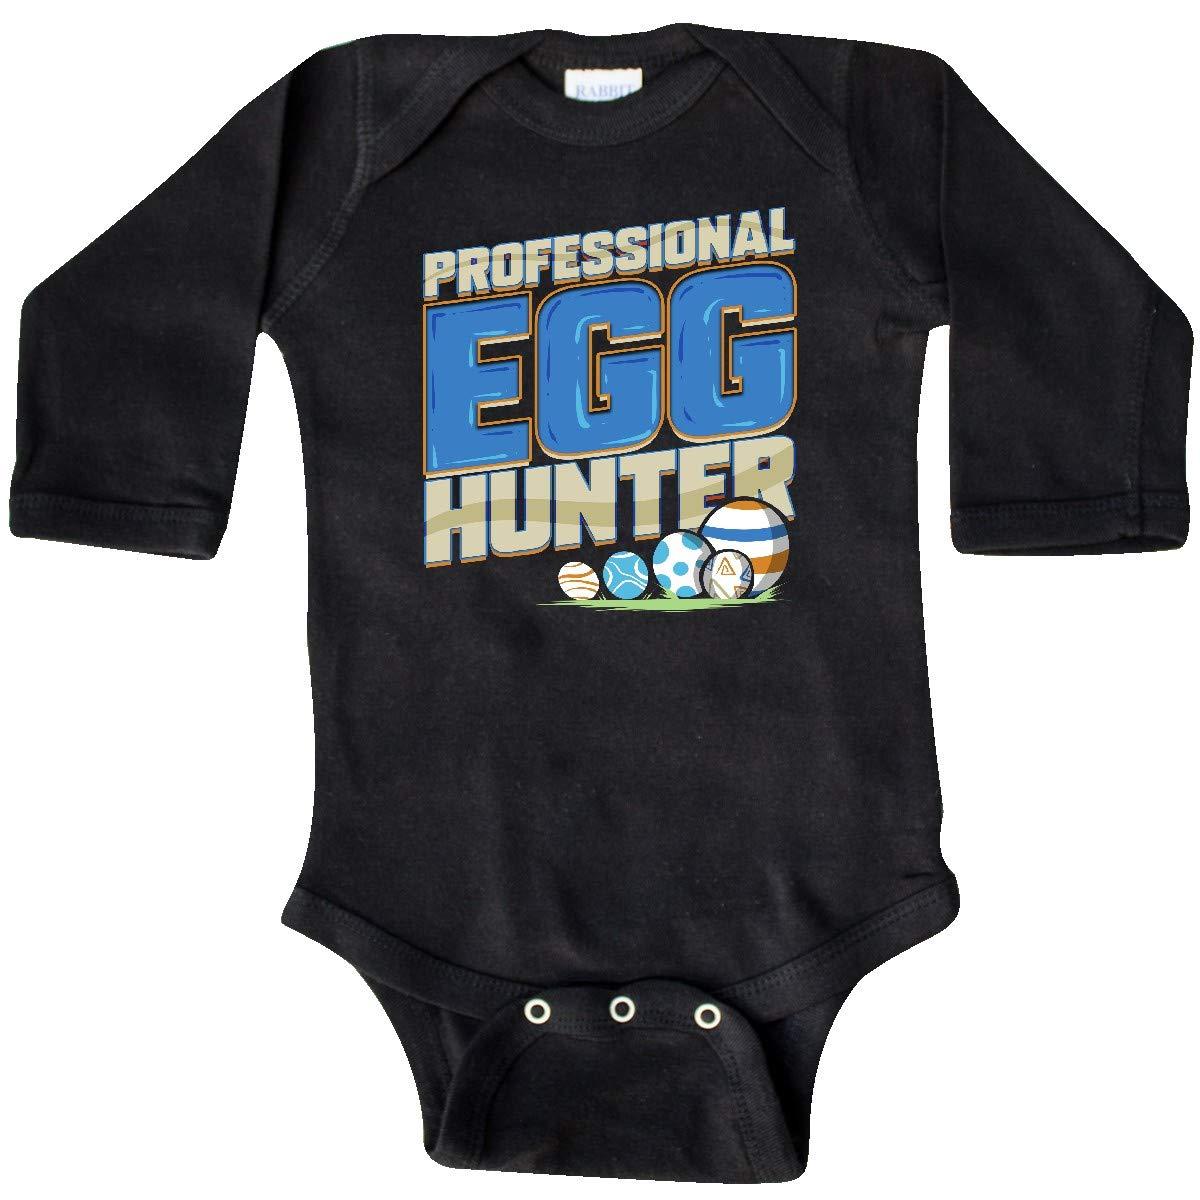 399f93e2315 Amazon.com  inktastic - Easter Professional Egg Hunter Long Sleeve Creeper  340f8  Clothing